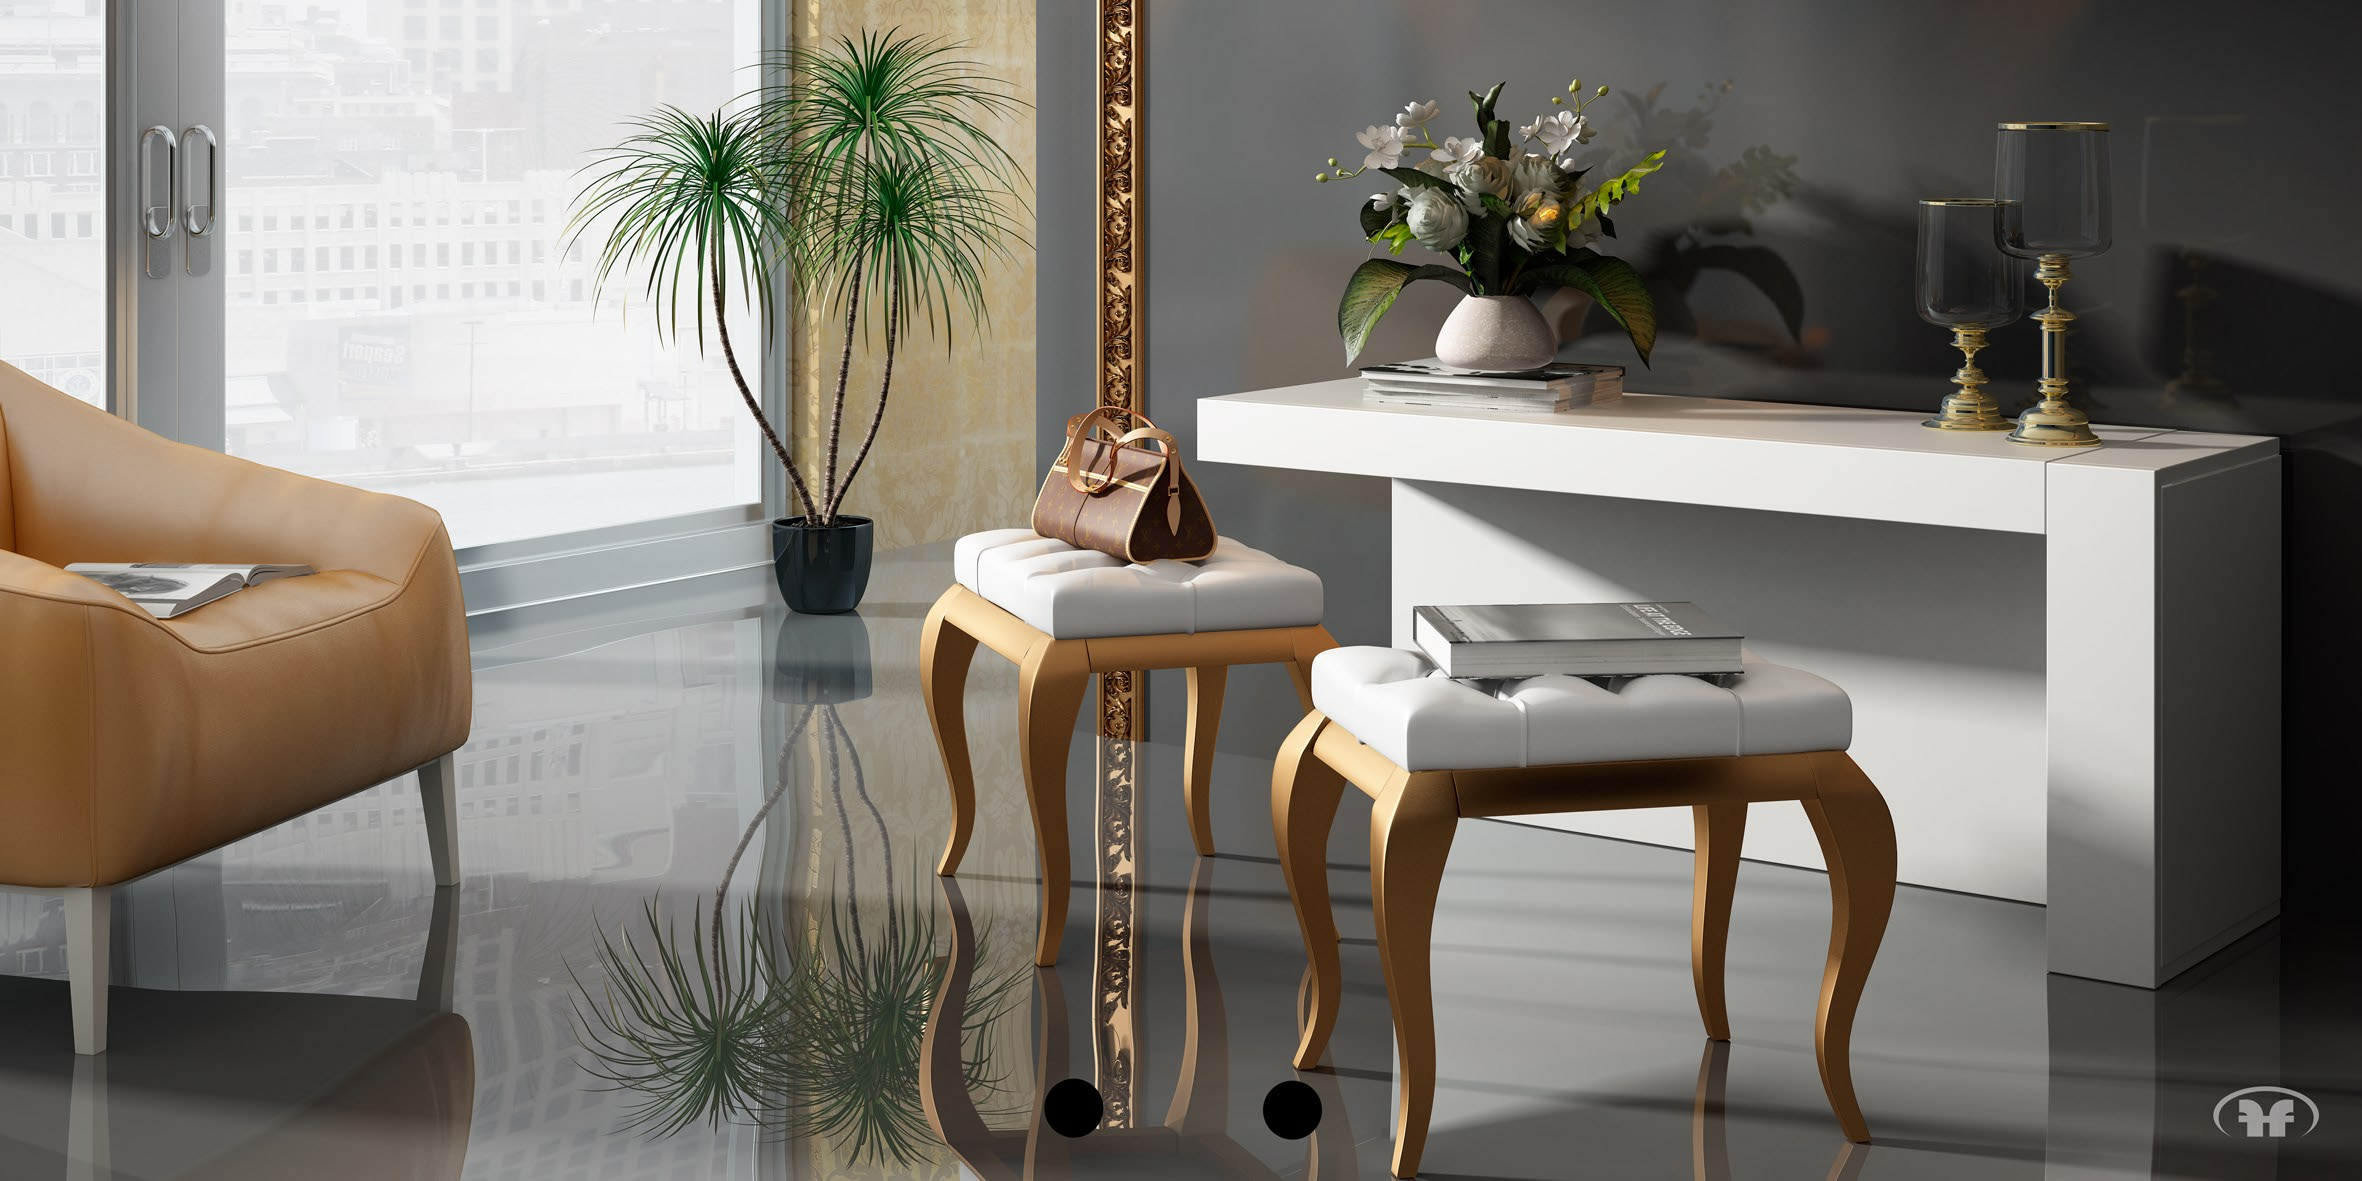 tocadores-Franco-muebles-paco-caballero-1220-5caf4b5a095d7